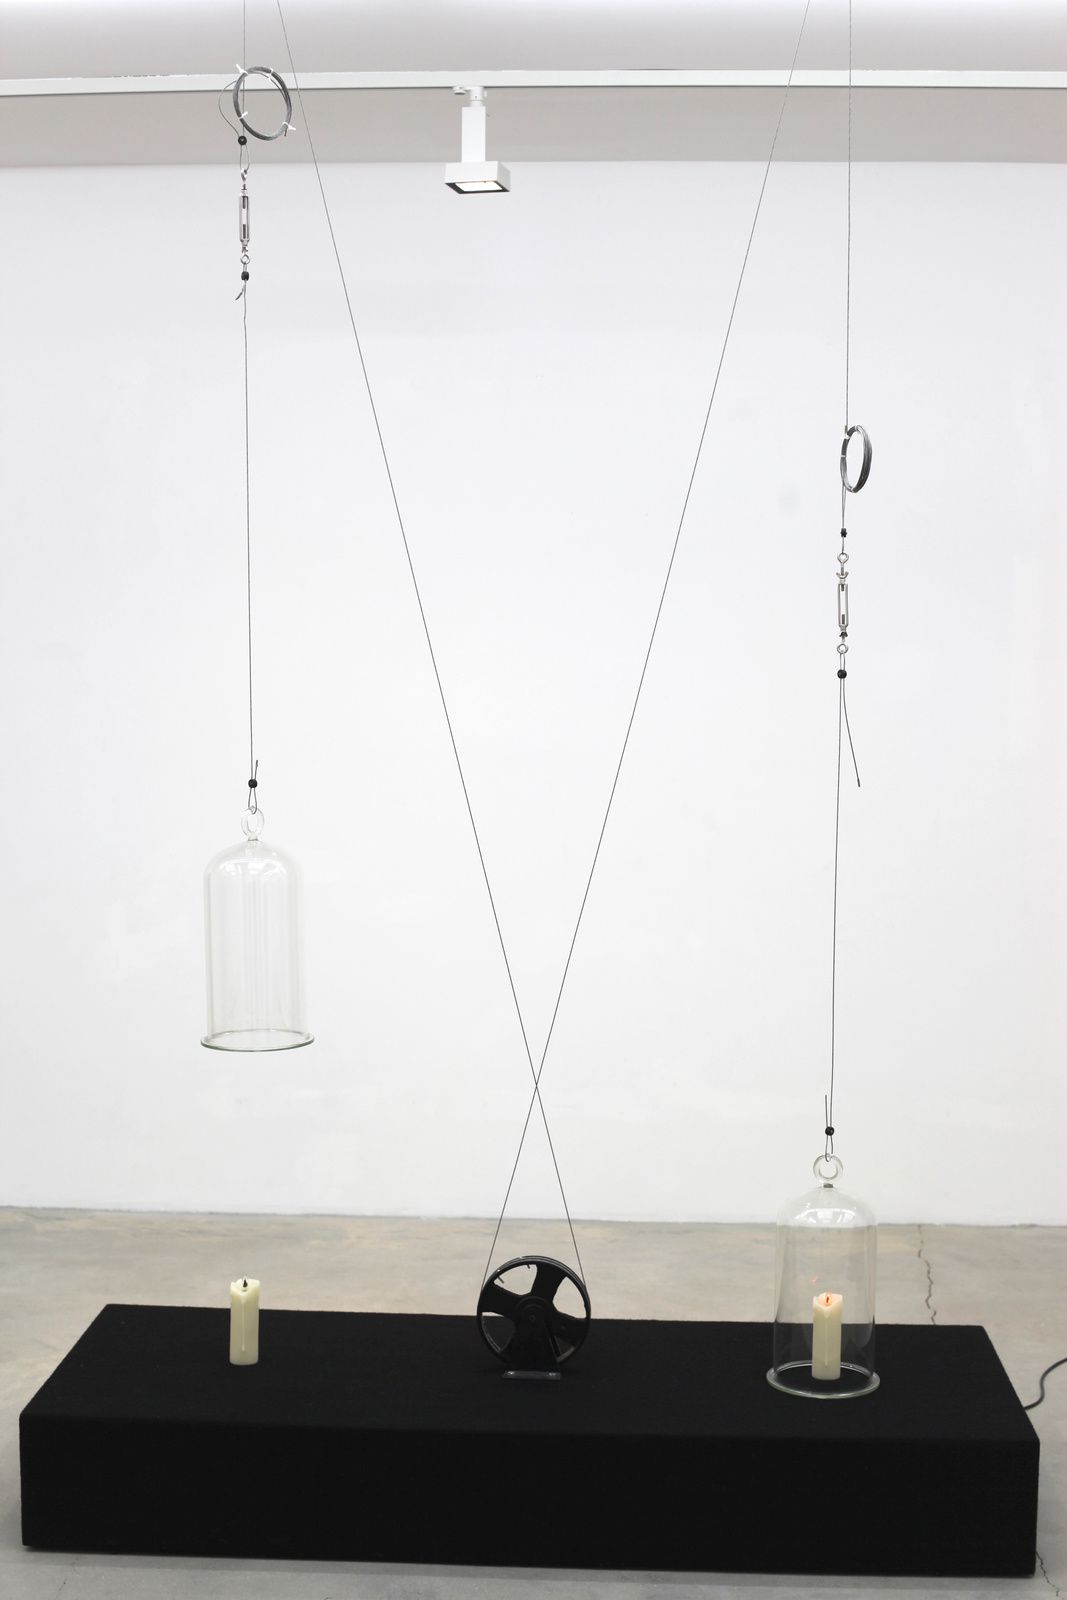 """id-od 12"", 2015 Sculpture Interactive de Sunil GAWDE - Courtesy Galerie Rabouan Moussion © Photo Éric Simon"